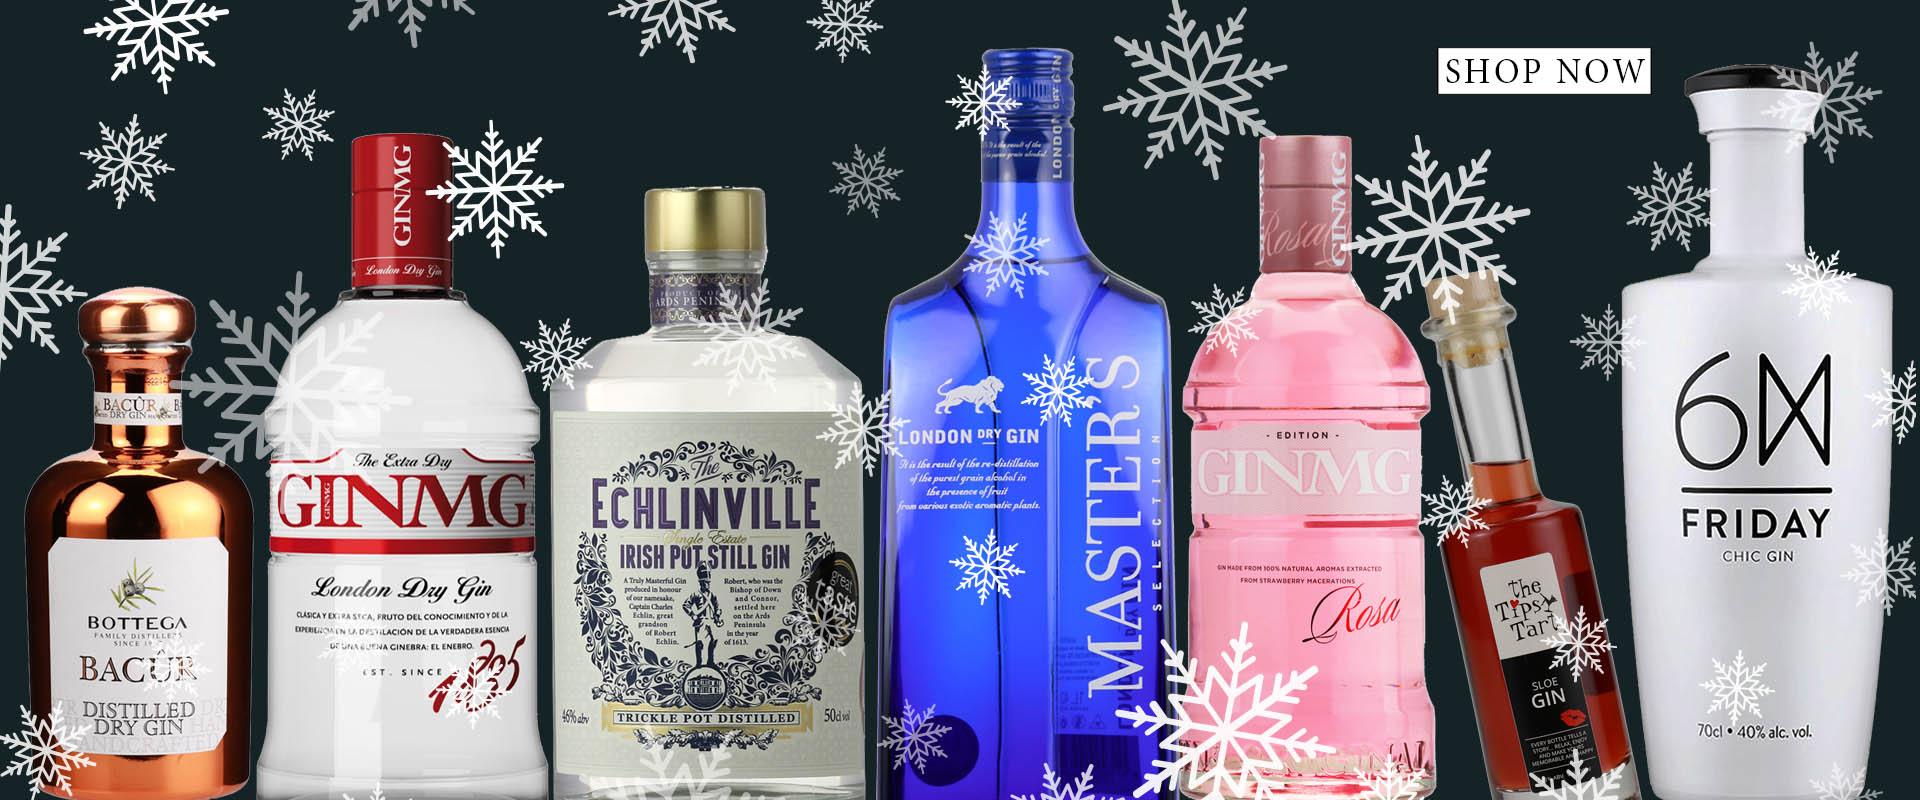 gin winter